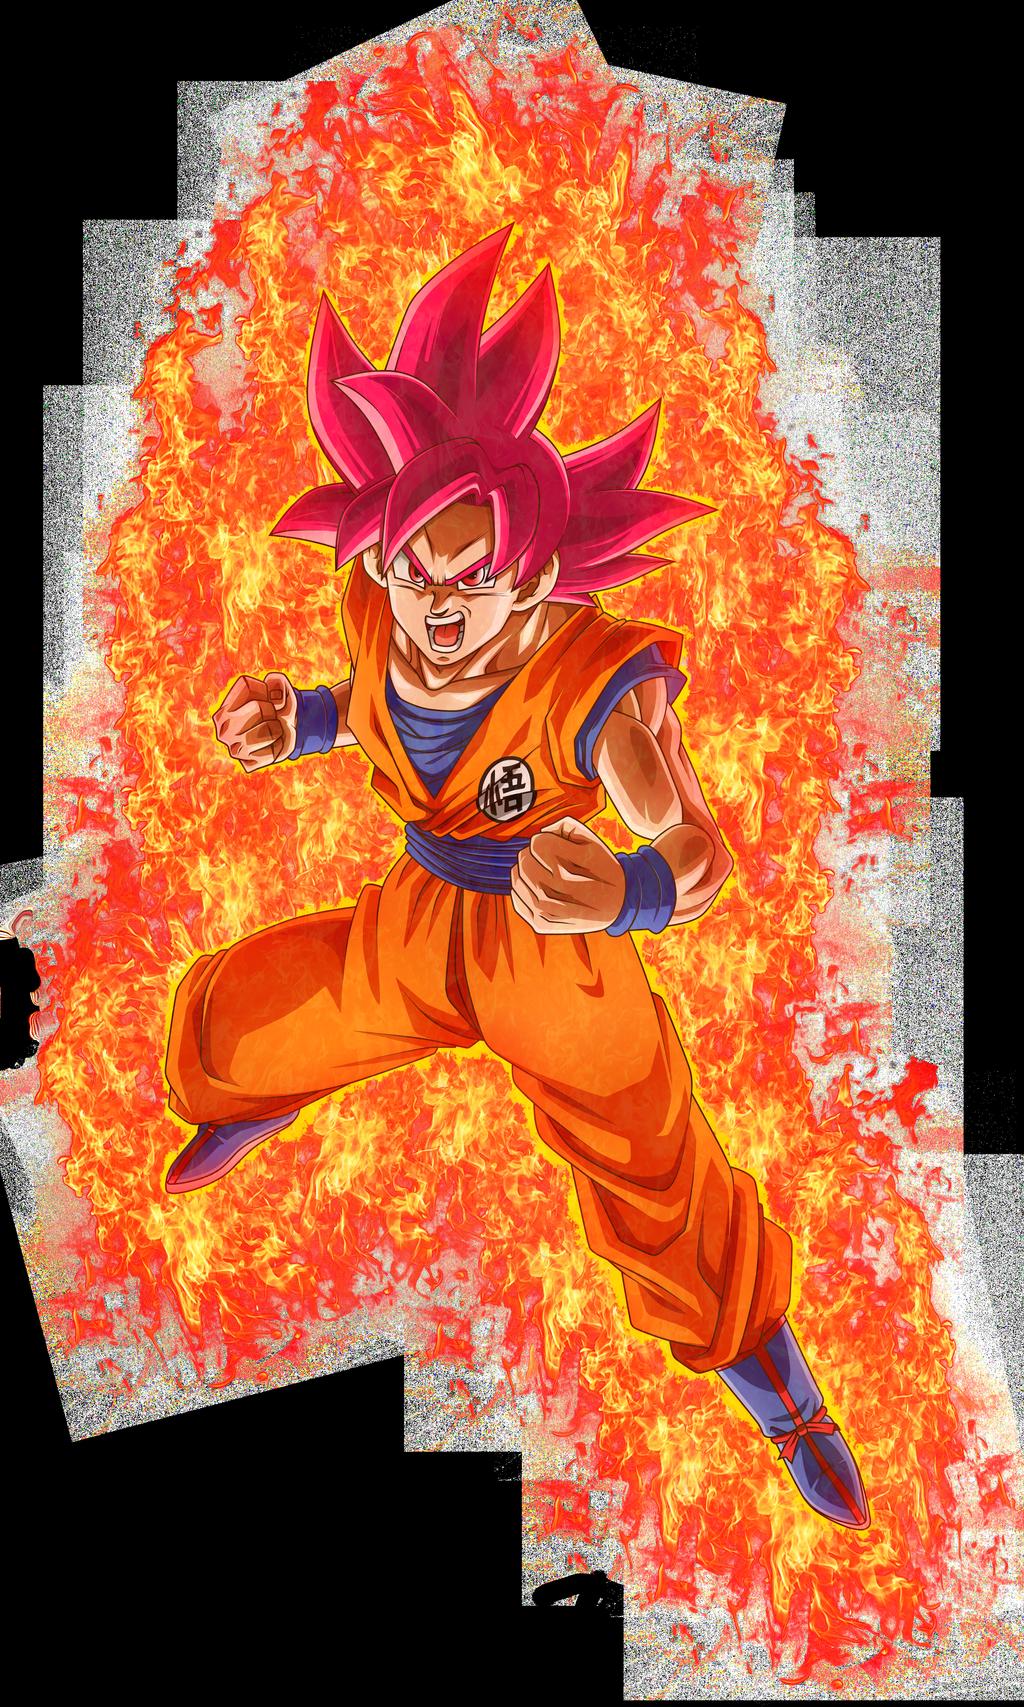 Super Saiyan Goddo 1 By Nekoar Anime Dragon Ball Super Dragon Ball Super Manga Dragon Ball Super Goku